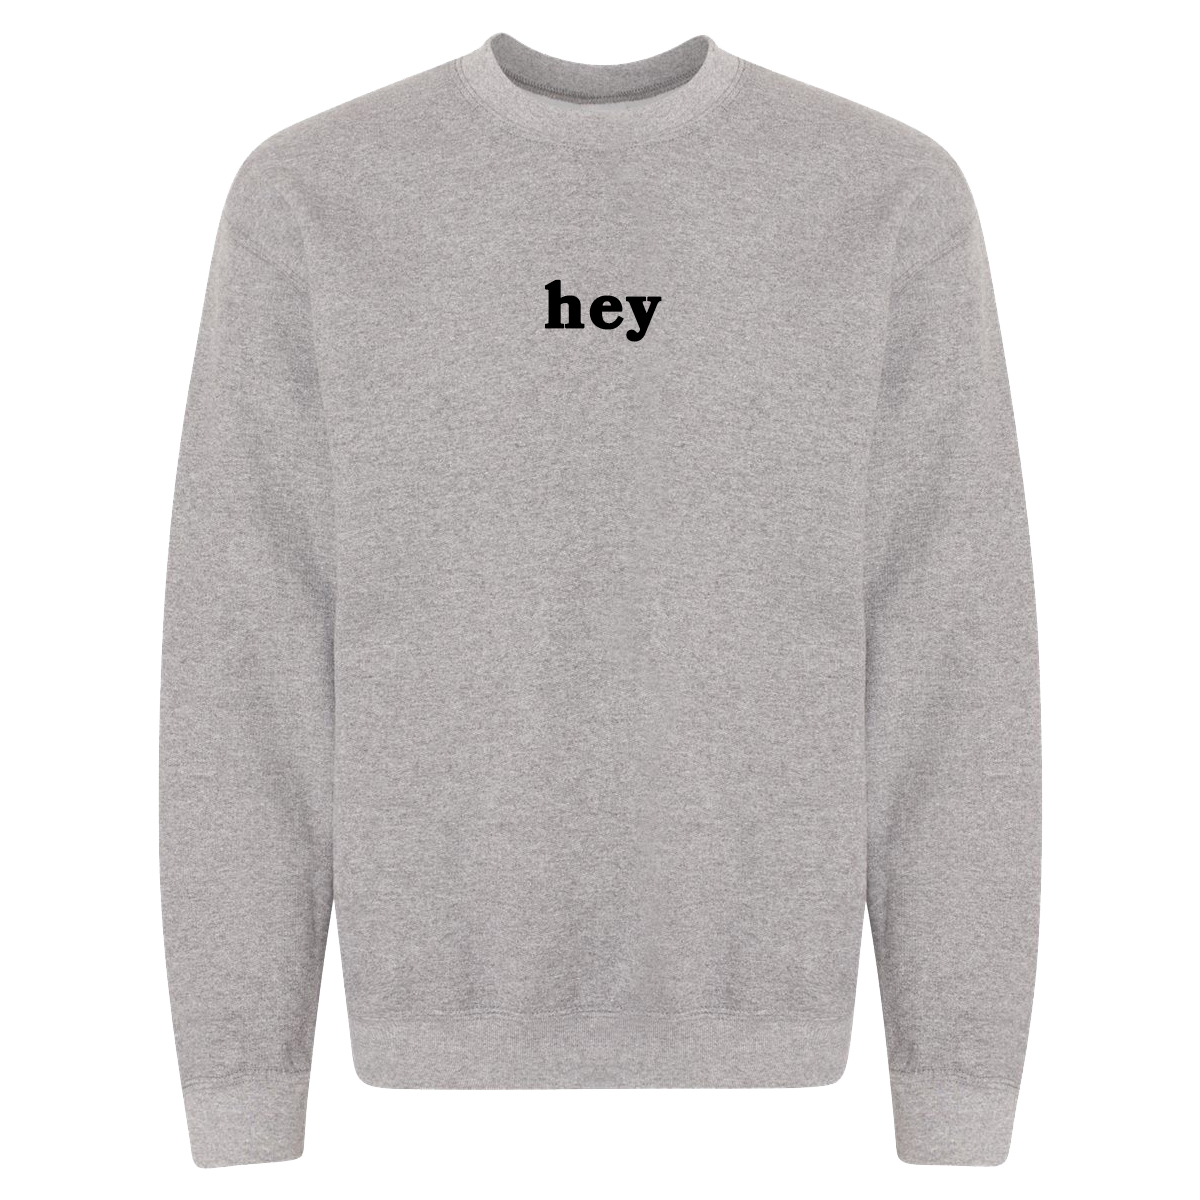 Hey Grey Crewneck Sweatshirt